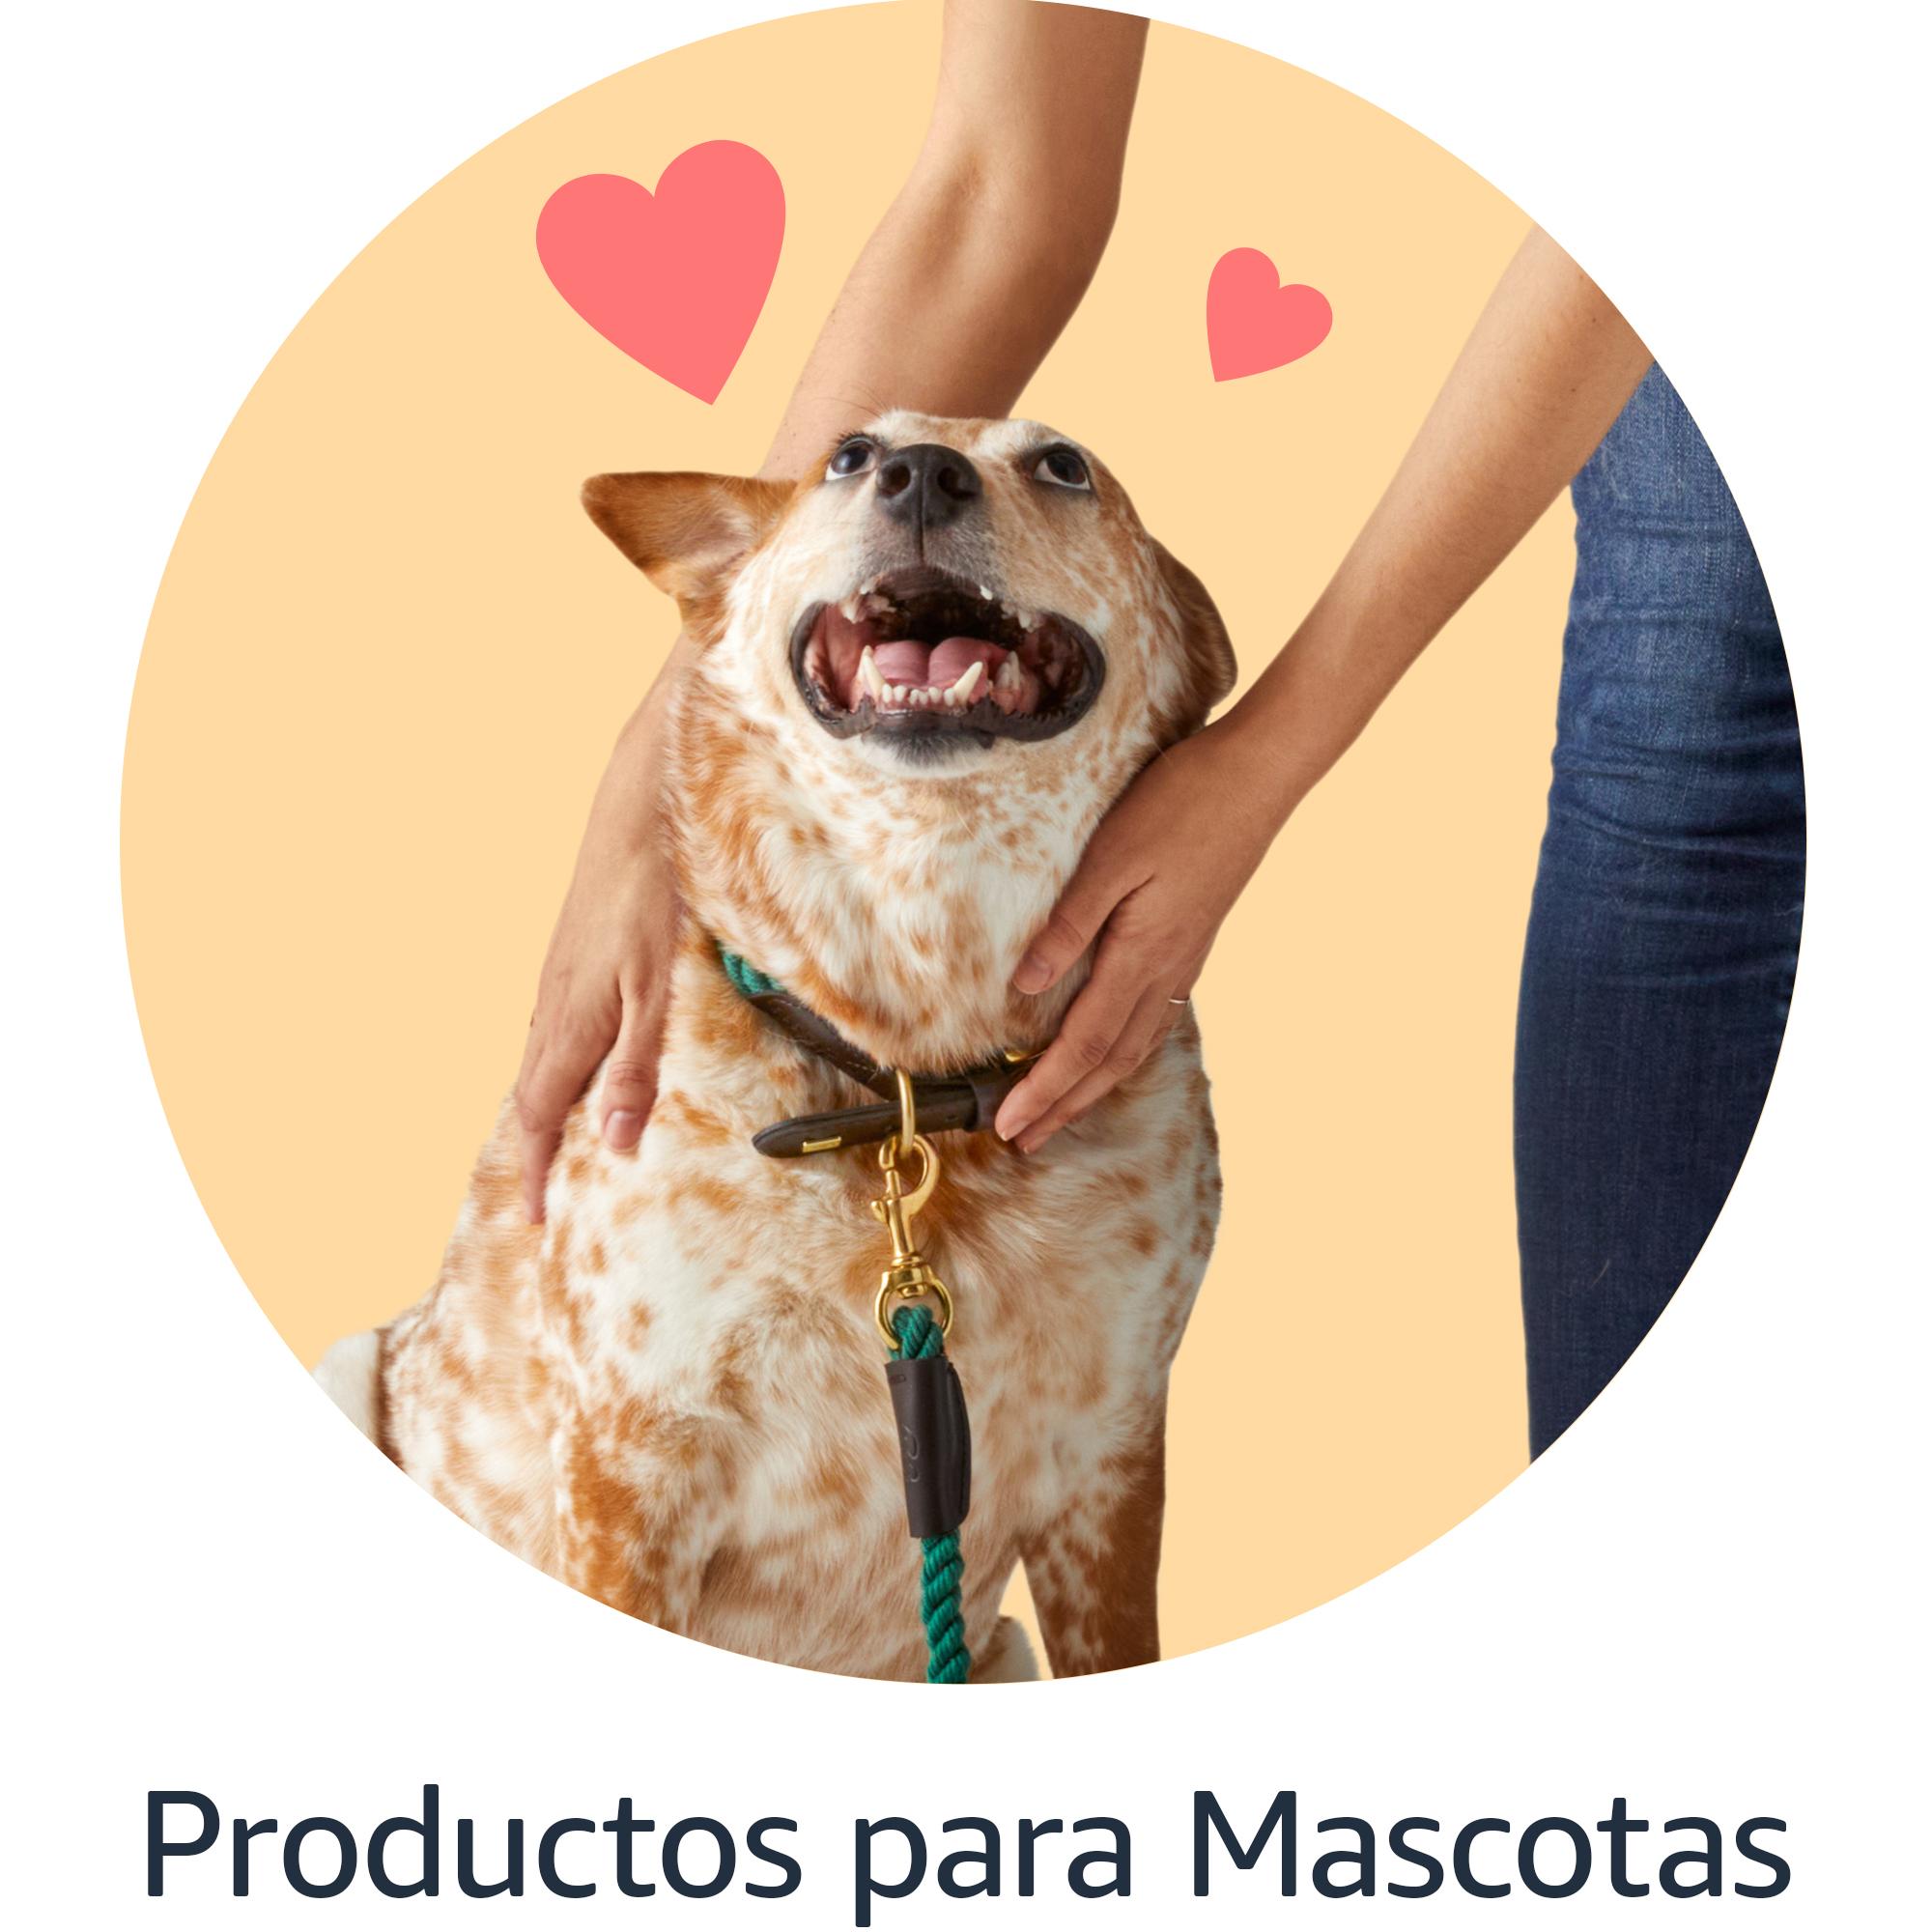 Productos para Mascotas